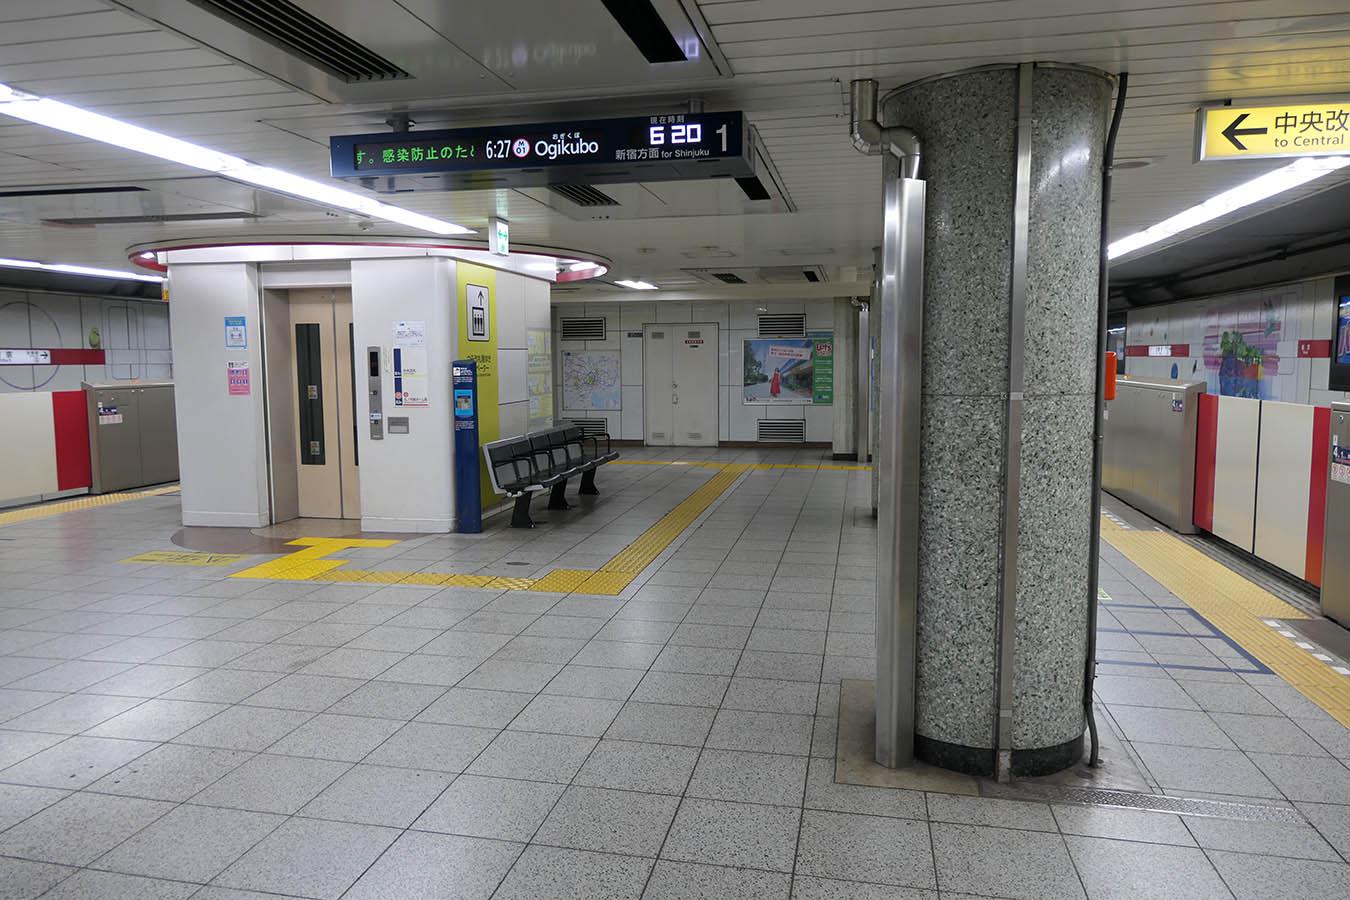 M17_photo04.jpg